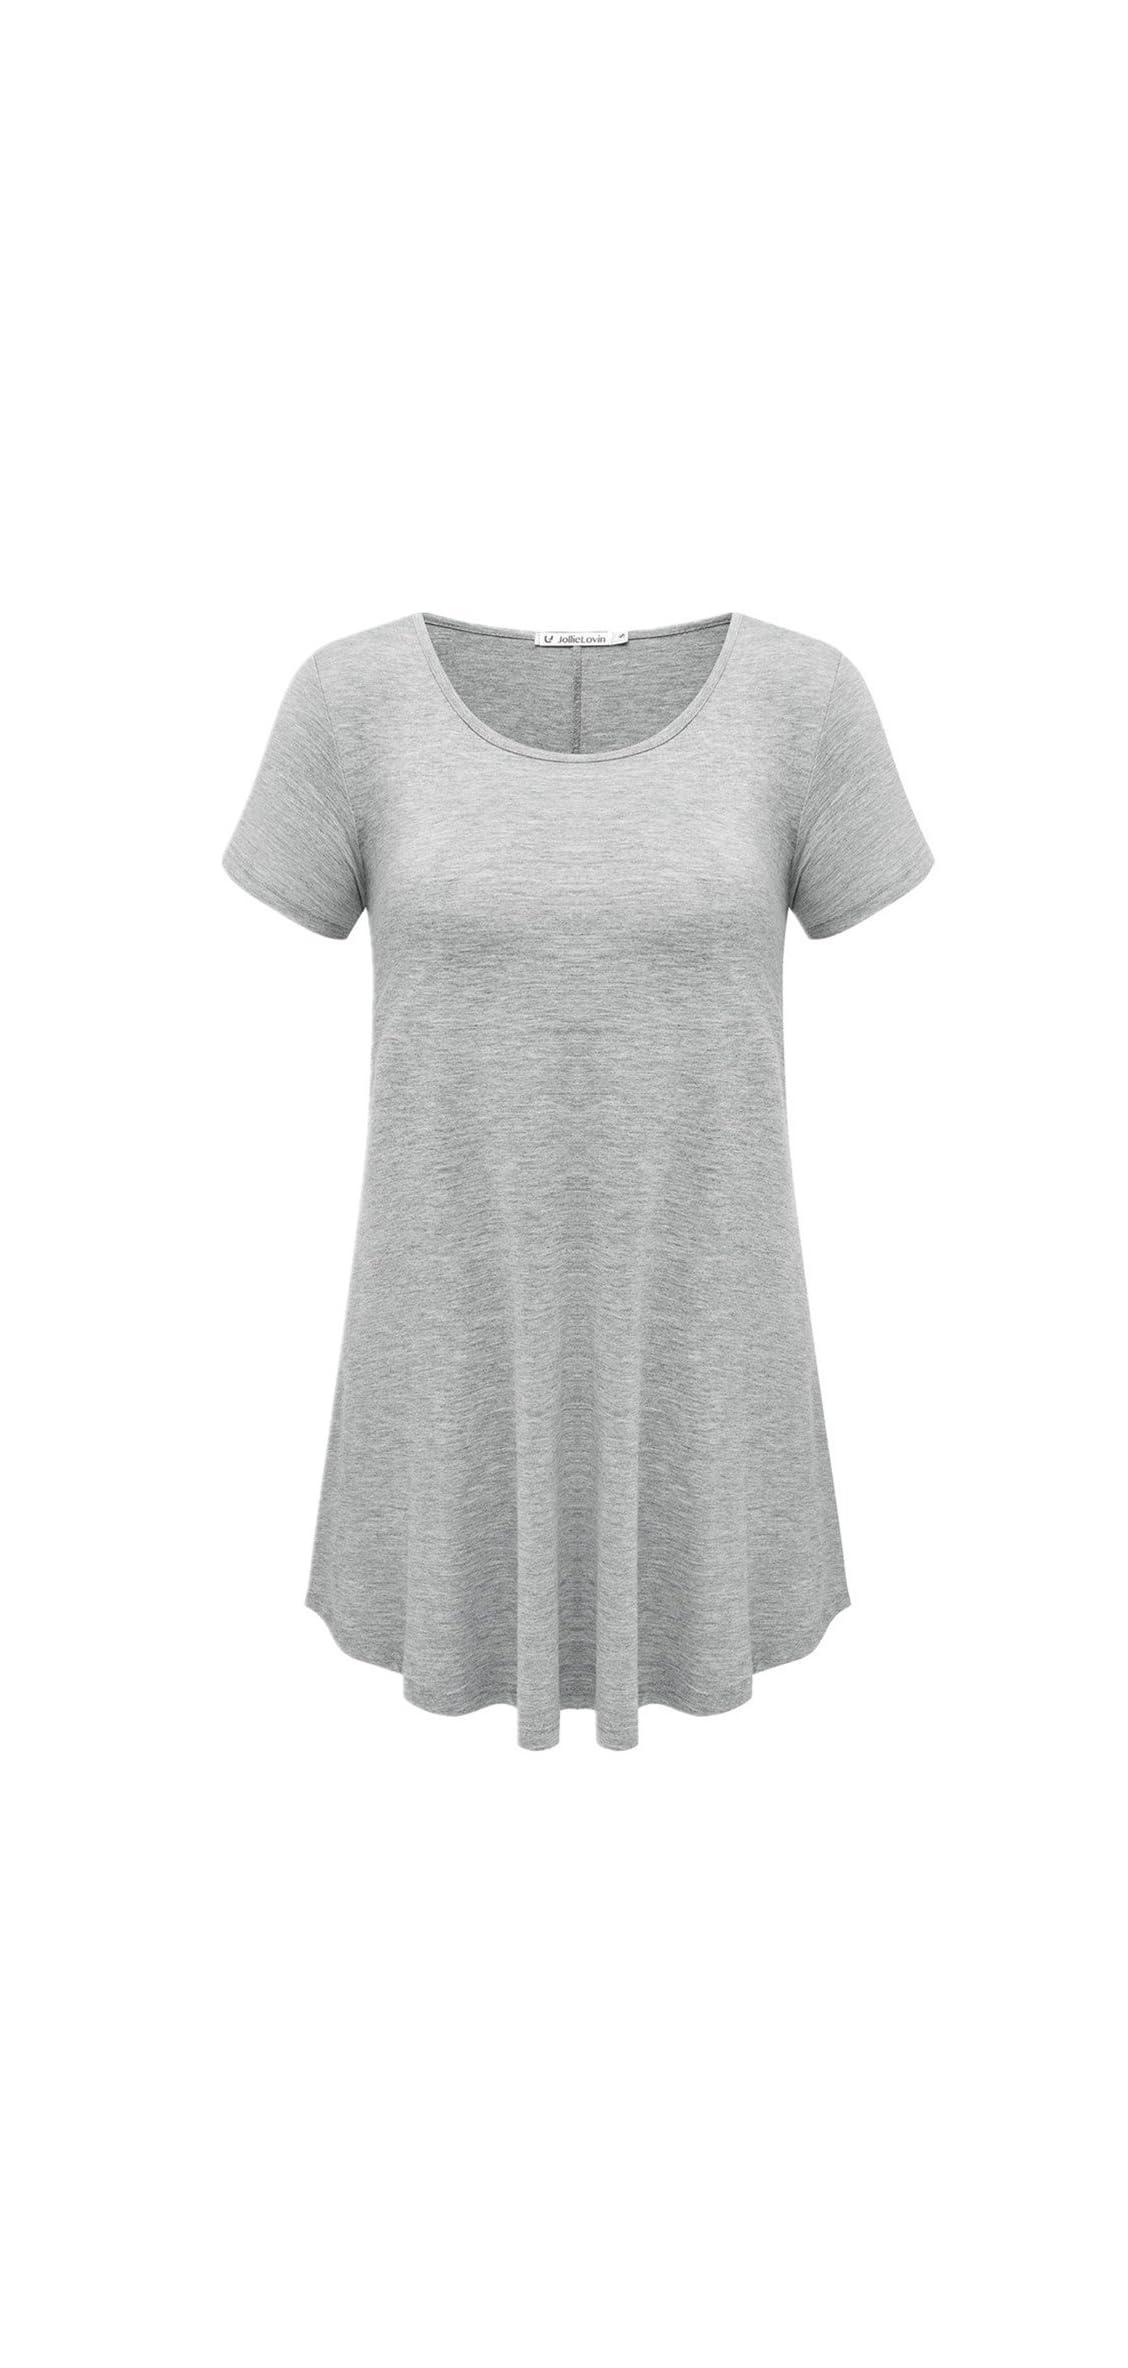 Women's Short Sleeve Loose Fit Flare Hem T Shirt Top